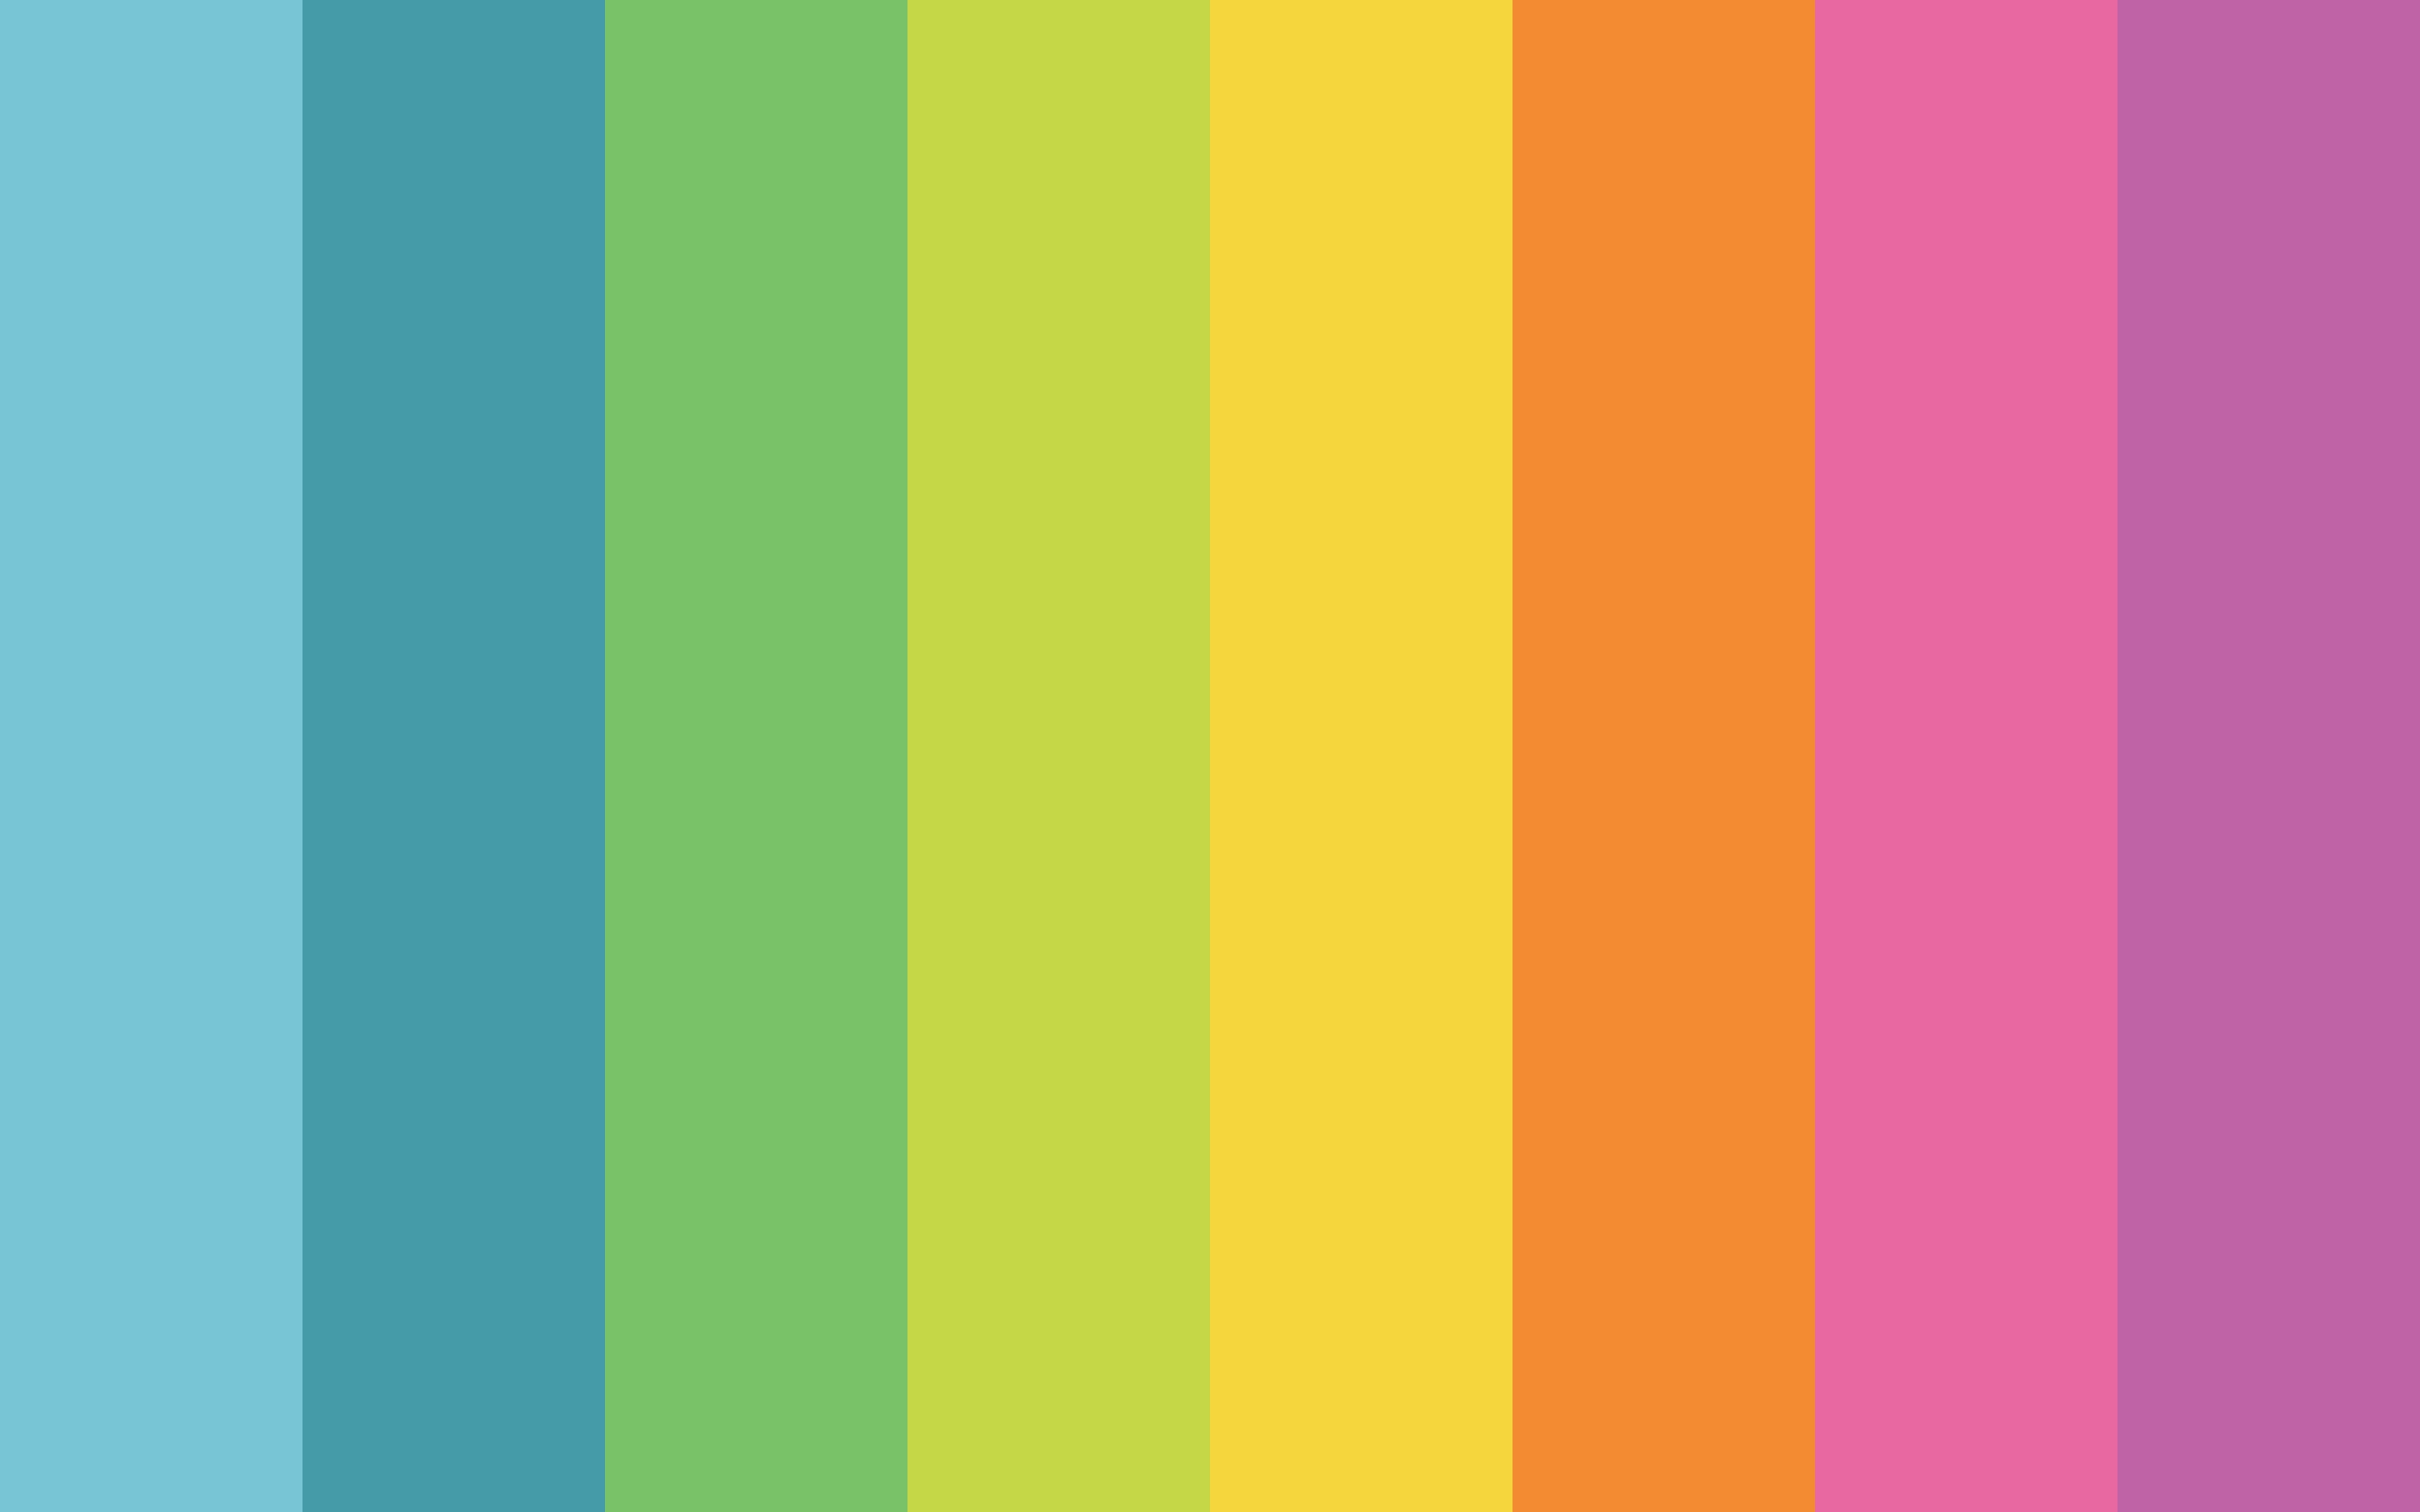 Rainbow Curve Desktop - Rainbow Curve Desktop